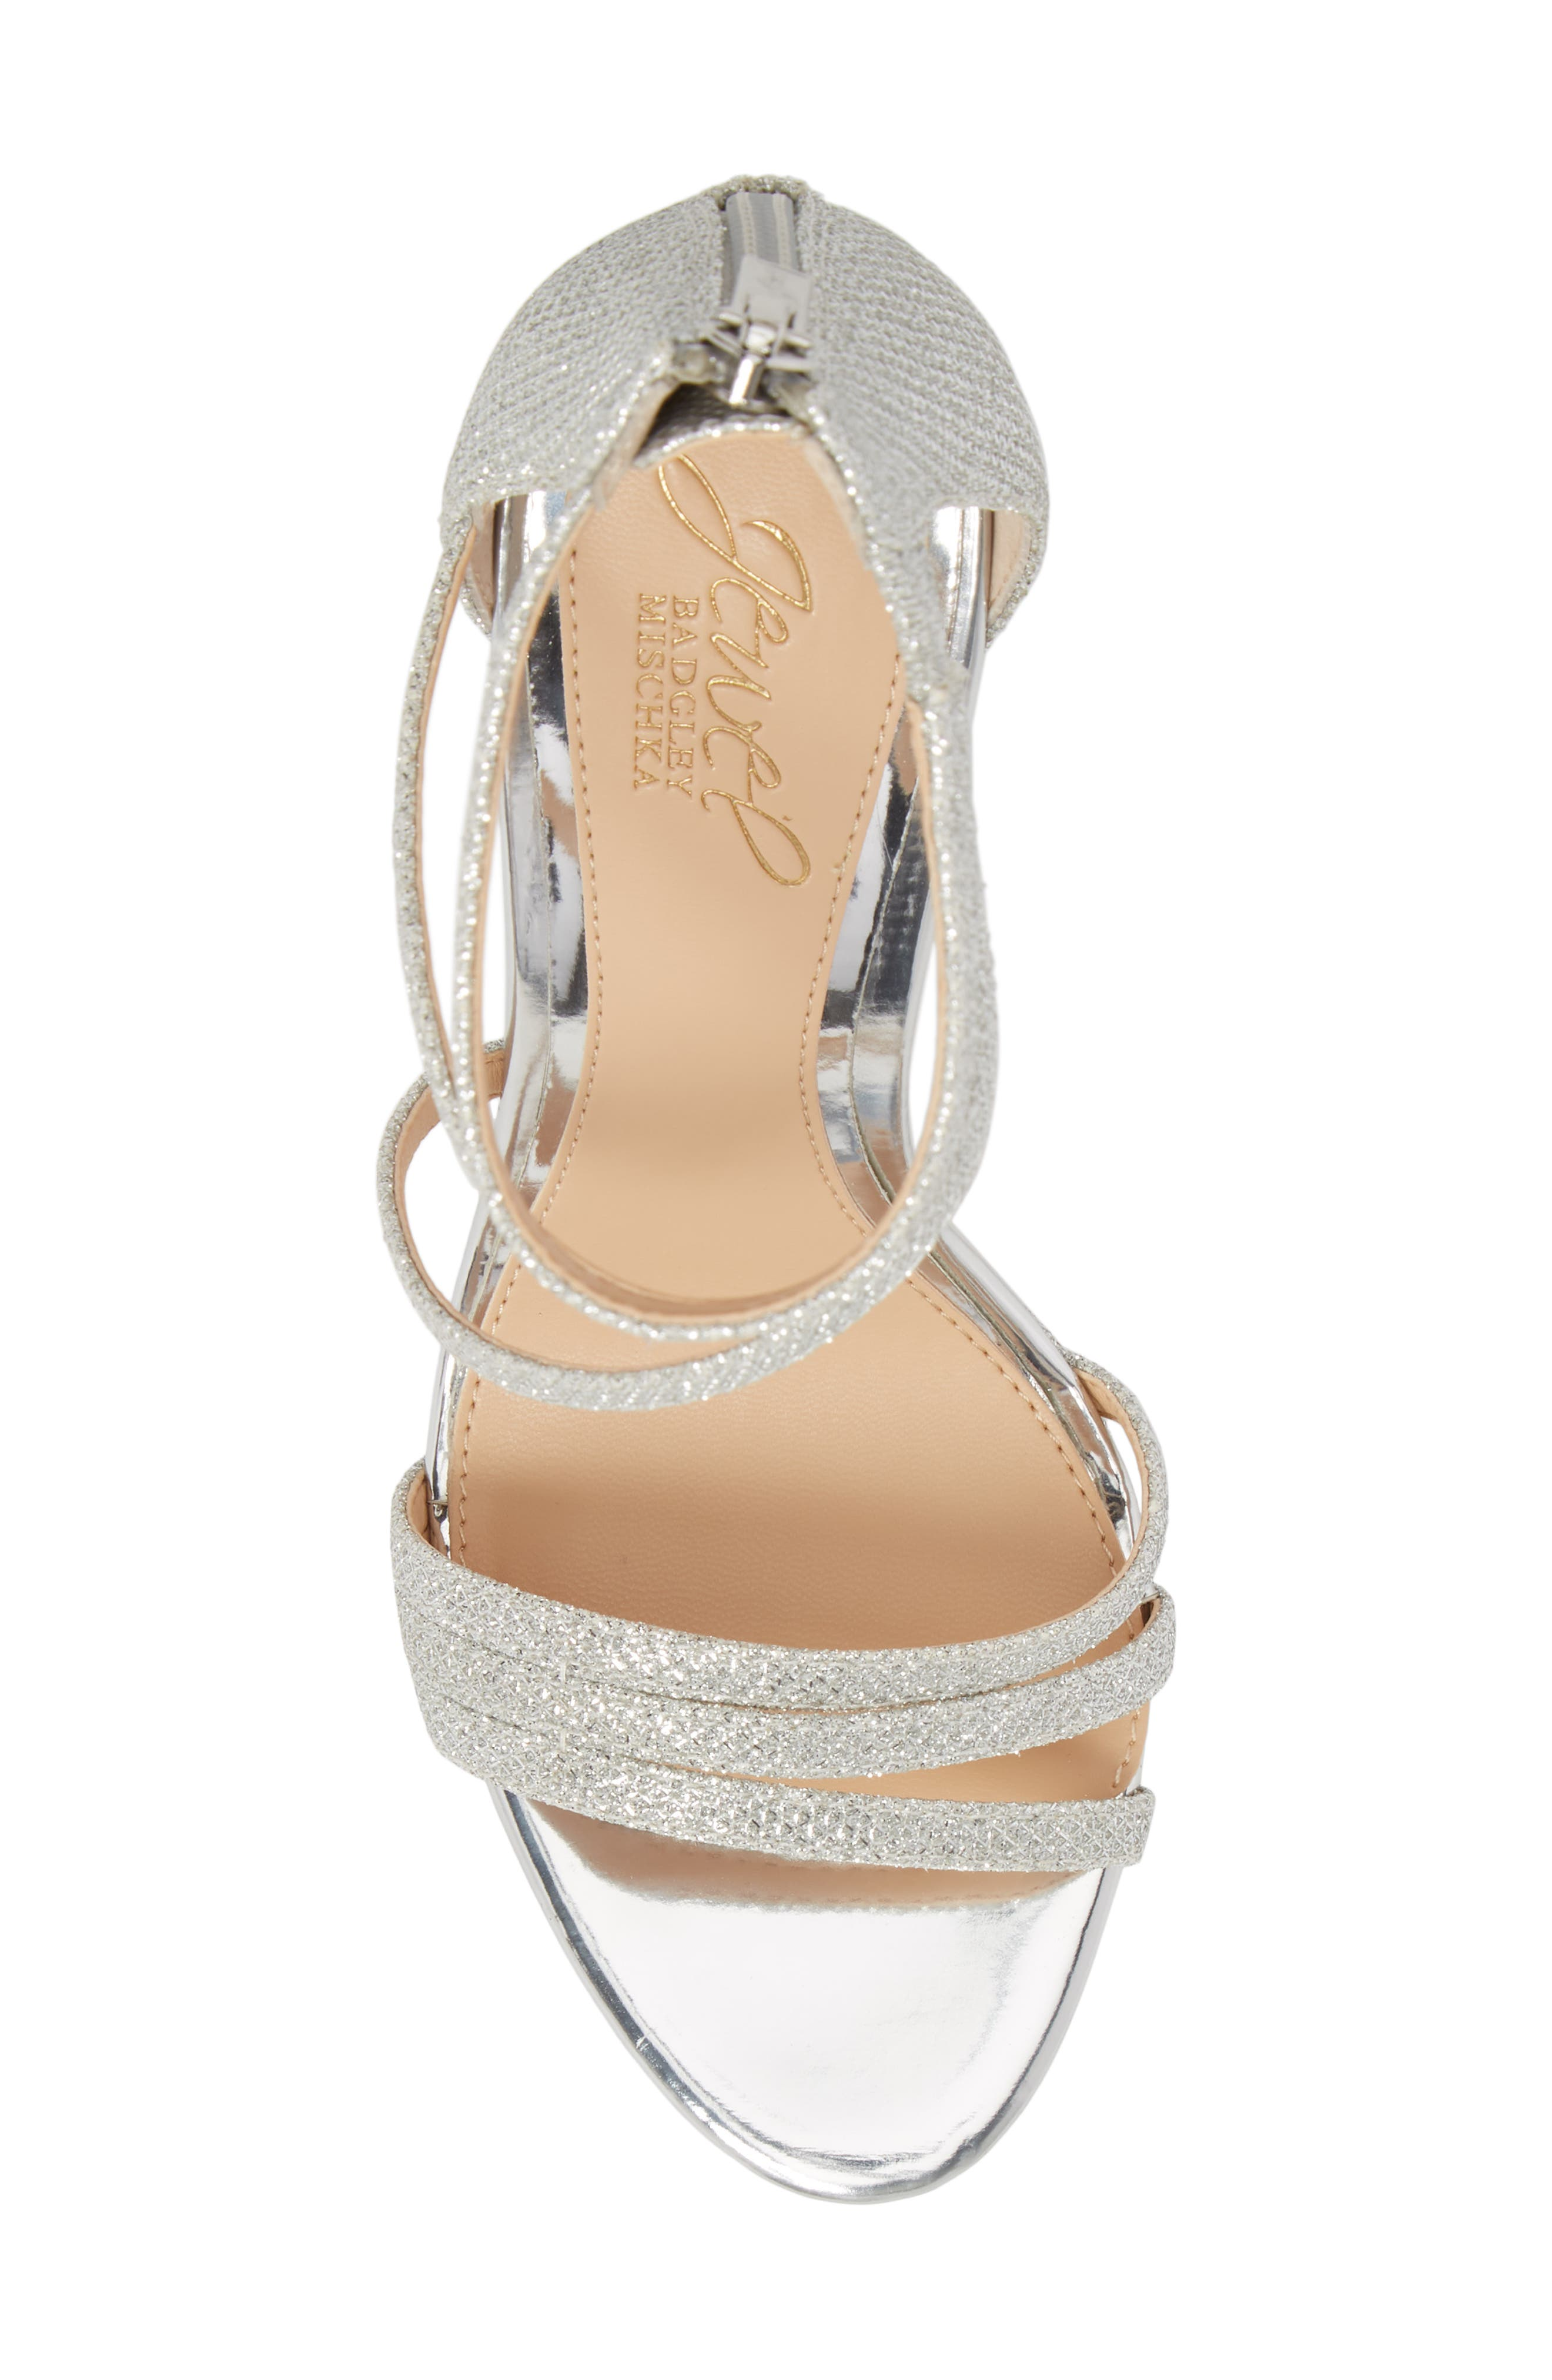 Maeva Platform Sandal,                             Alternate thumbnail 5, color,                             SILVER GLITTER FABRIC